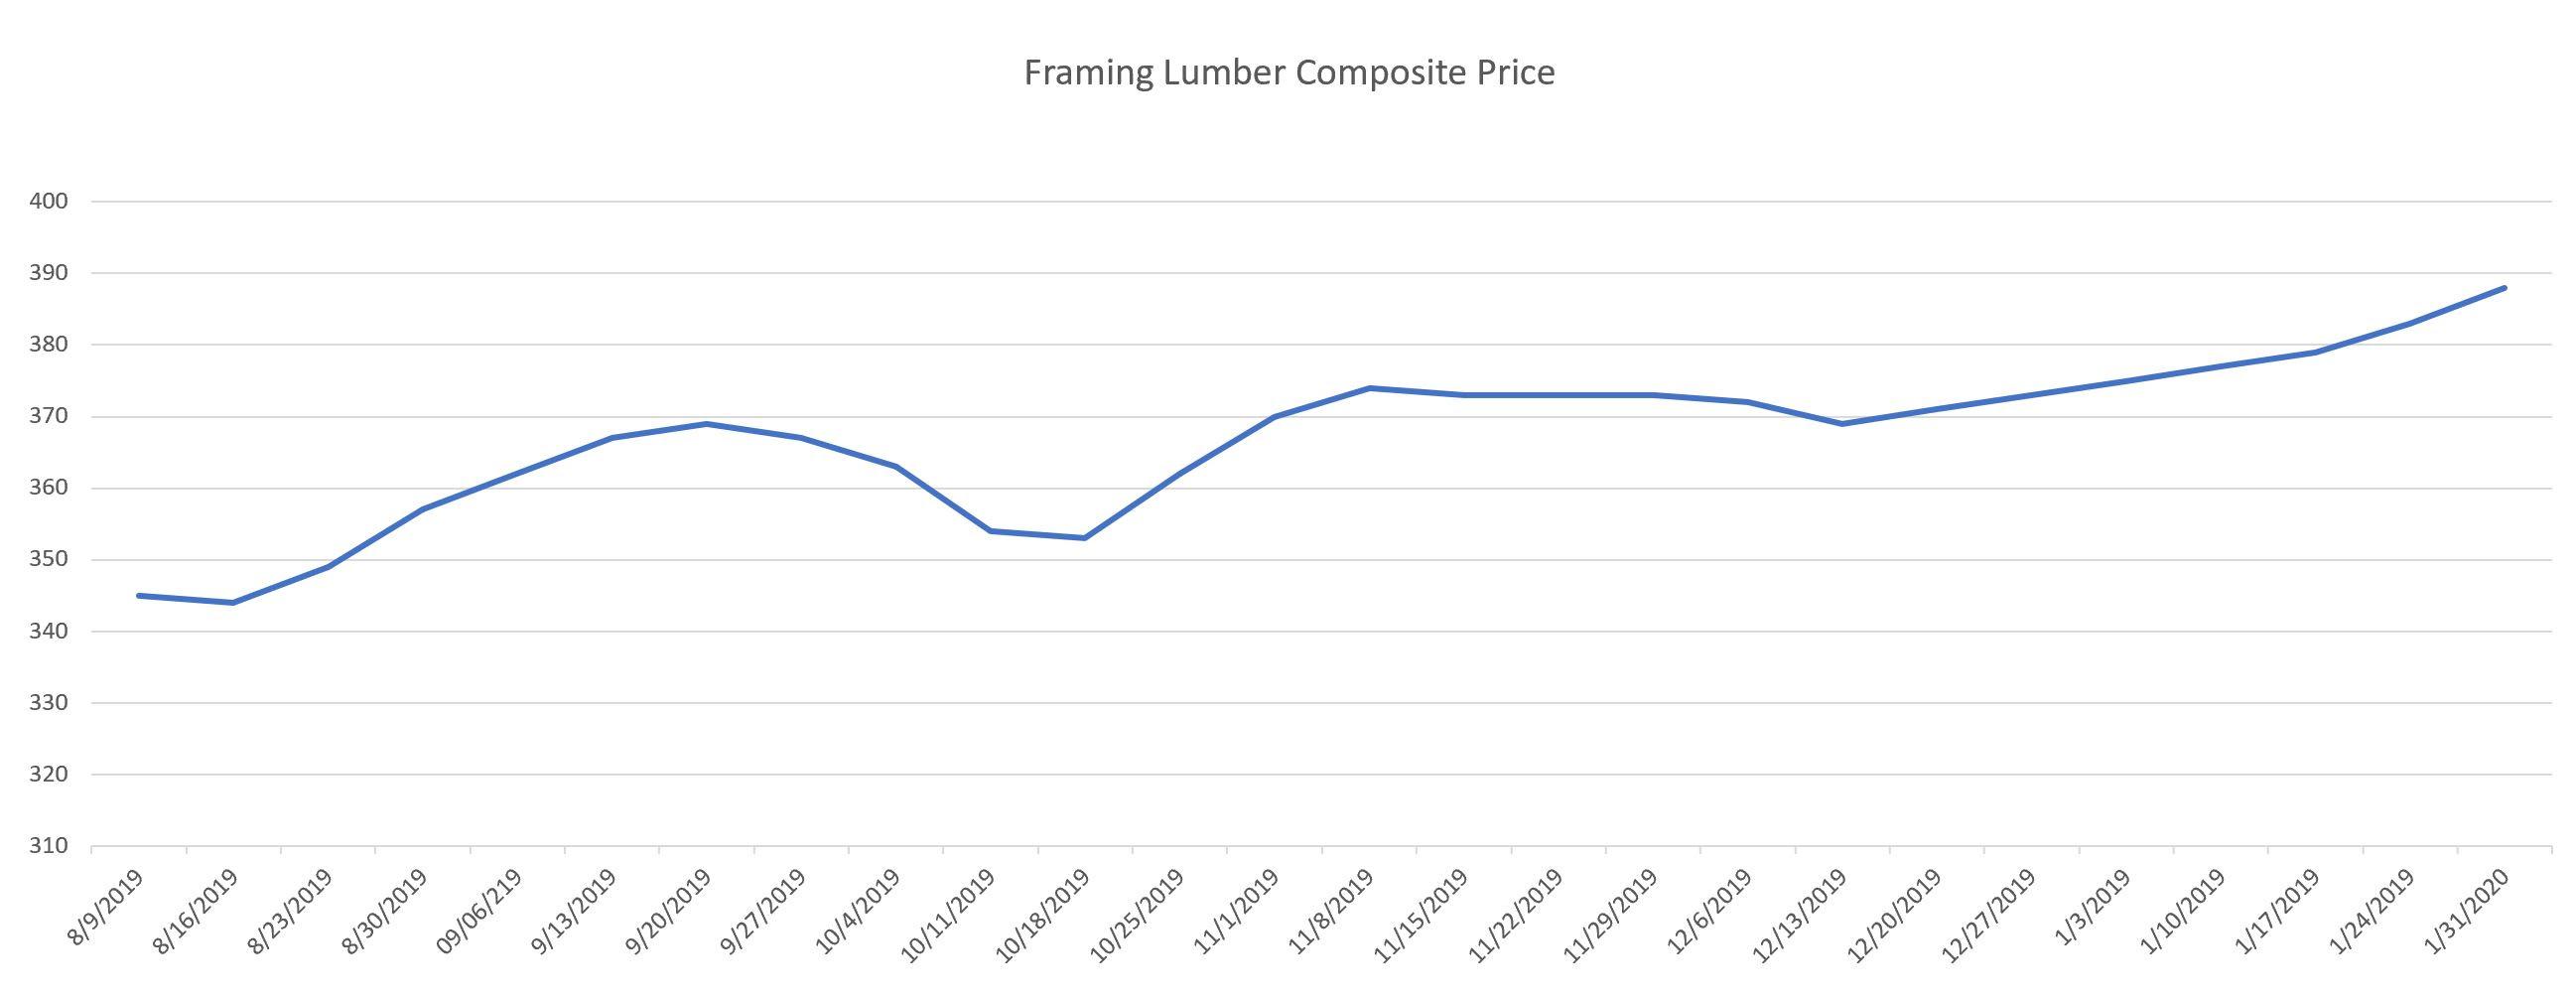 Framing Lumber Composite Price